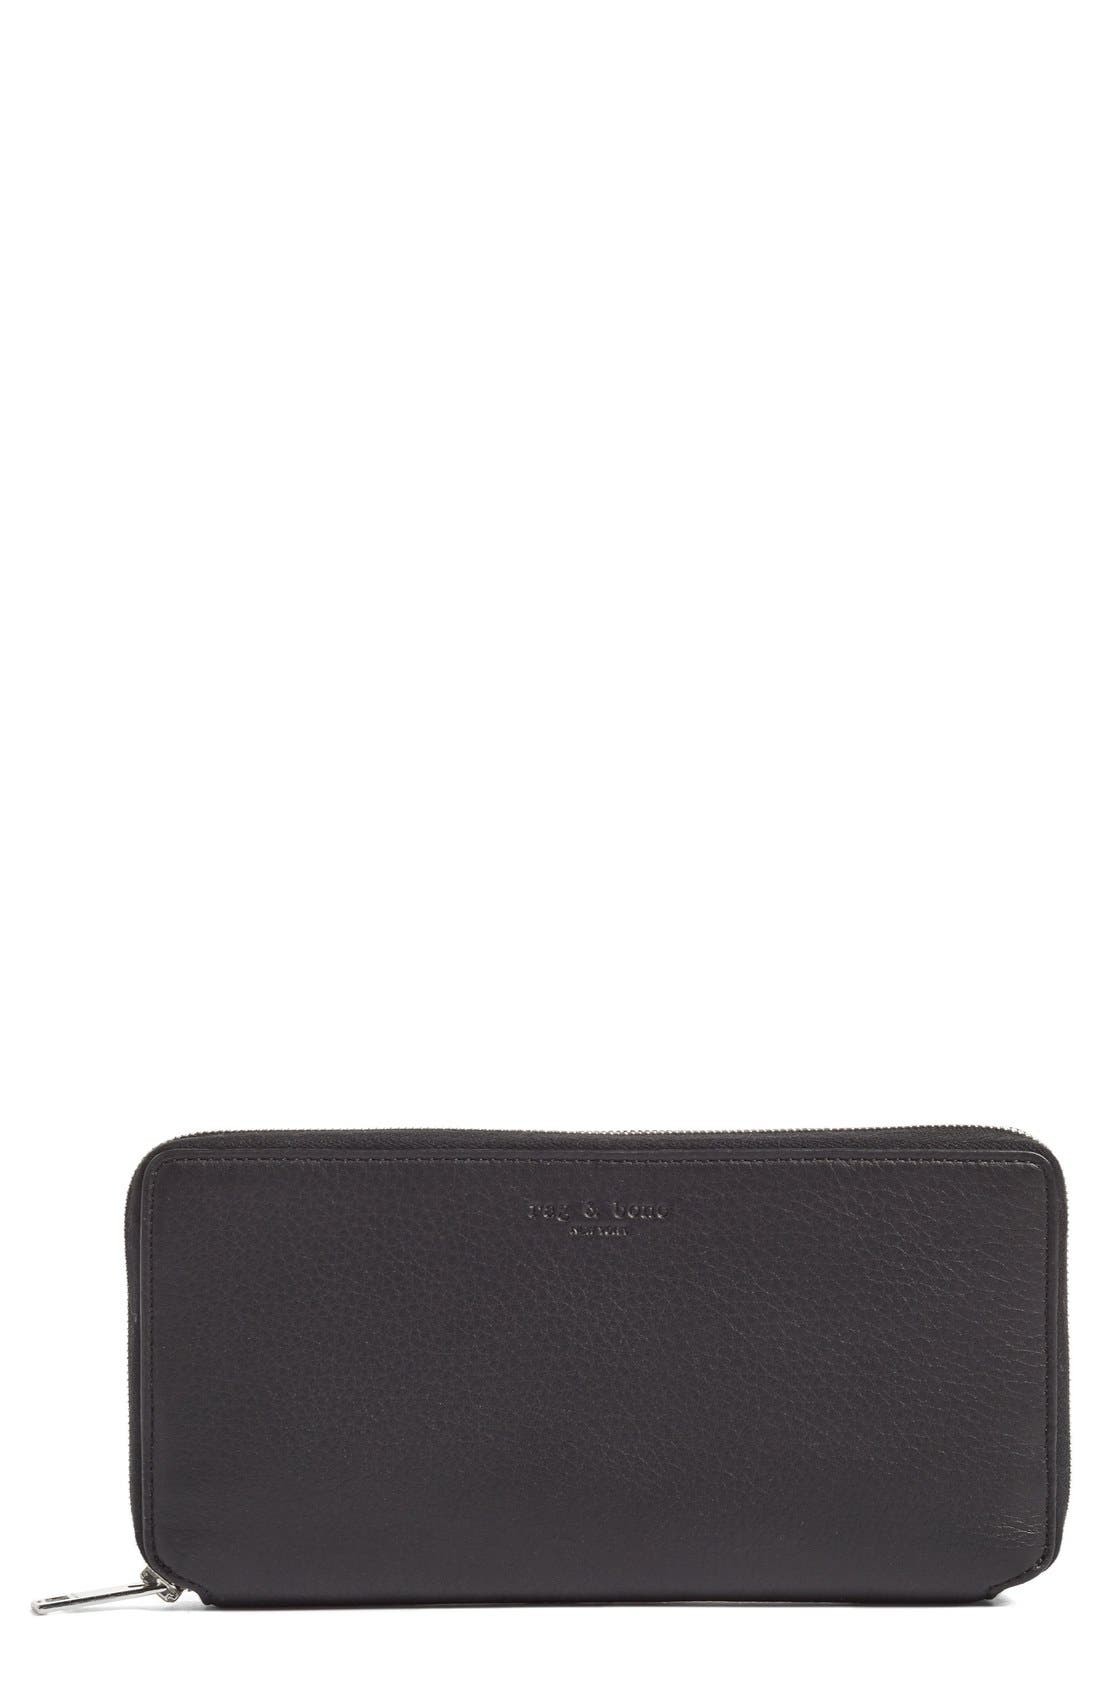 Rag & Bone Woman Textured-leather Wallet Taupe Size Rag & Bone dCilVrzKx